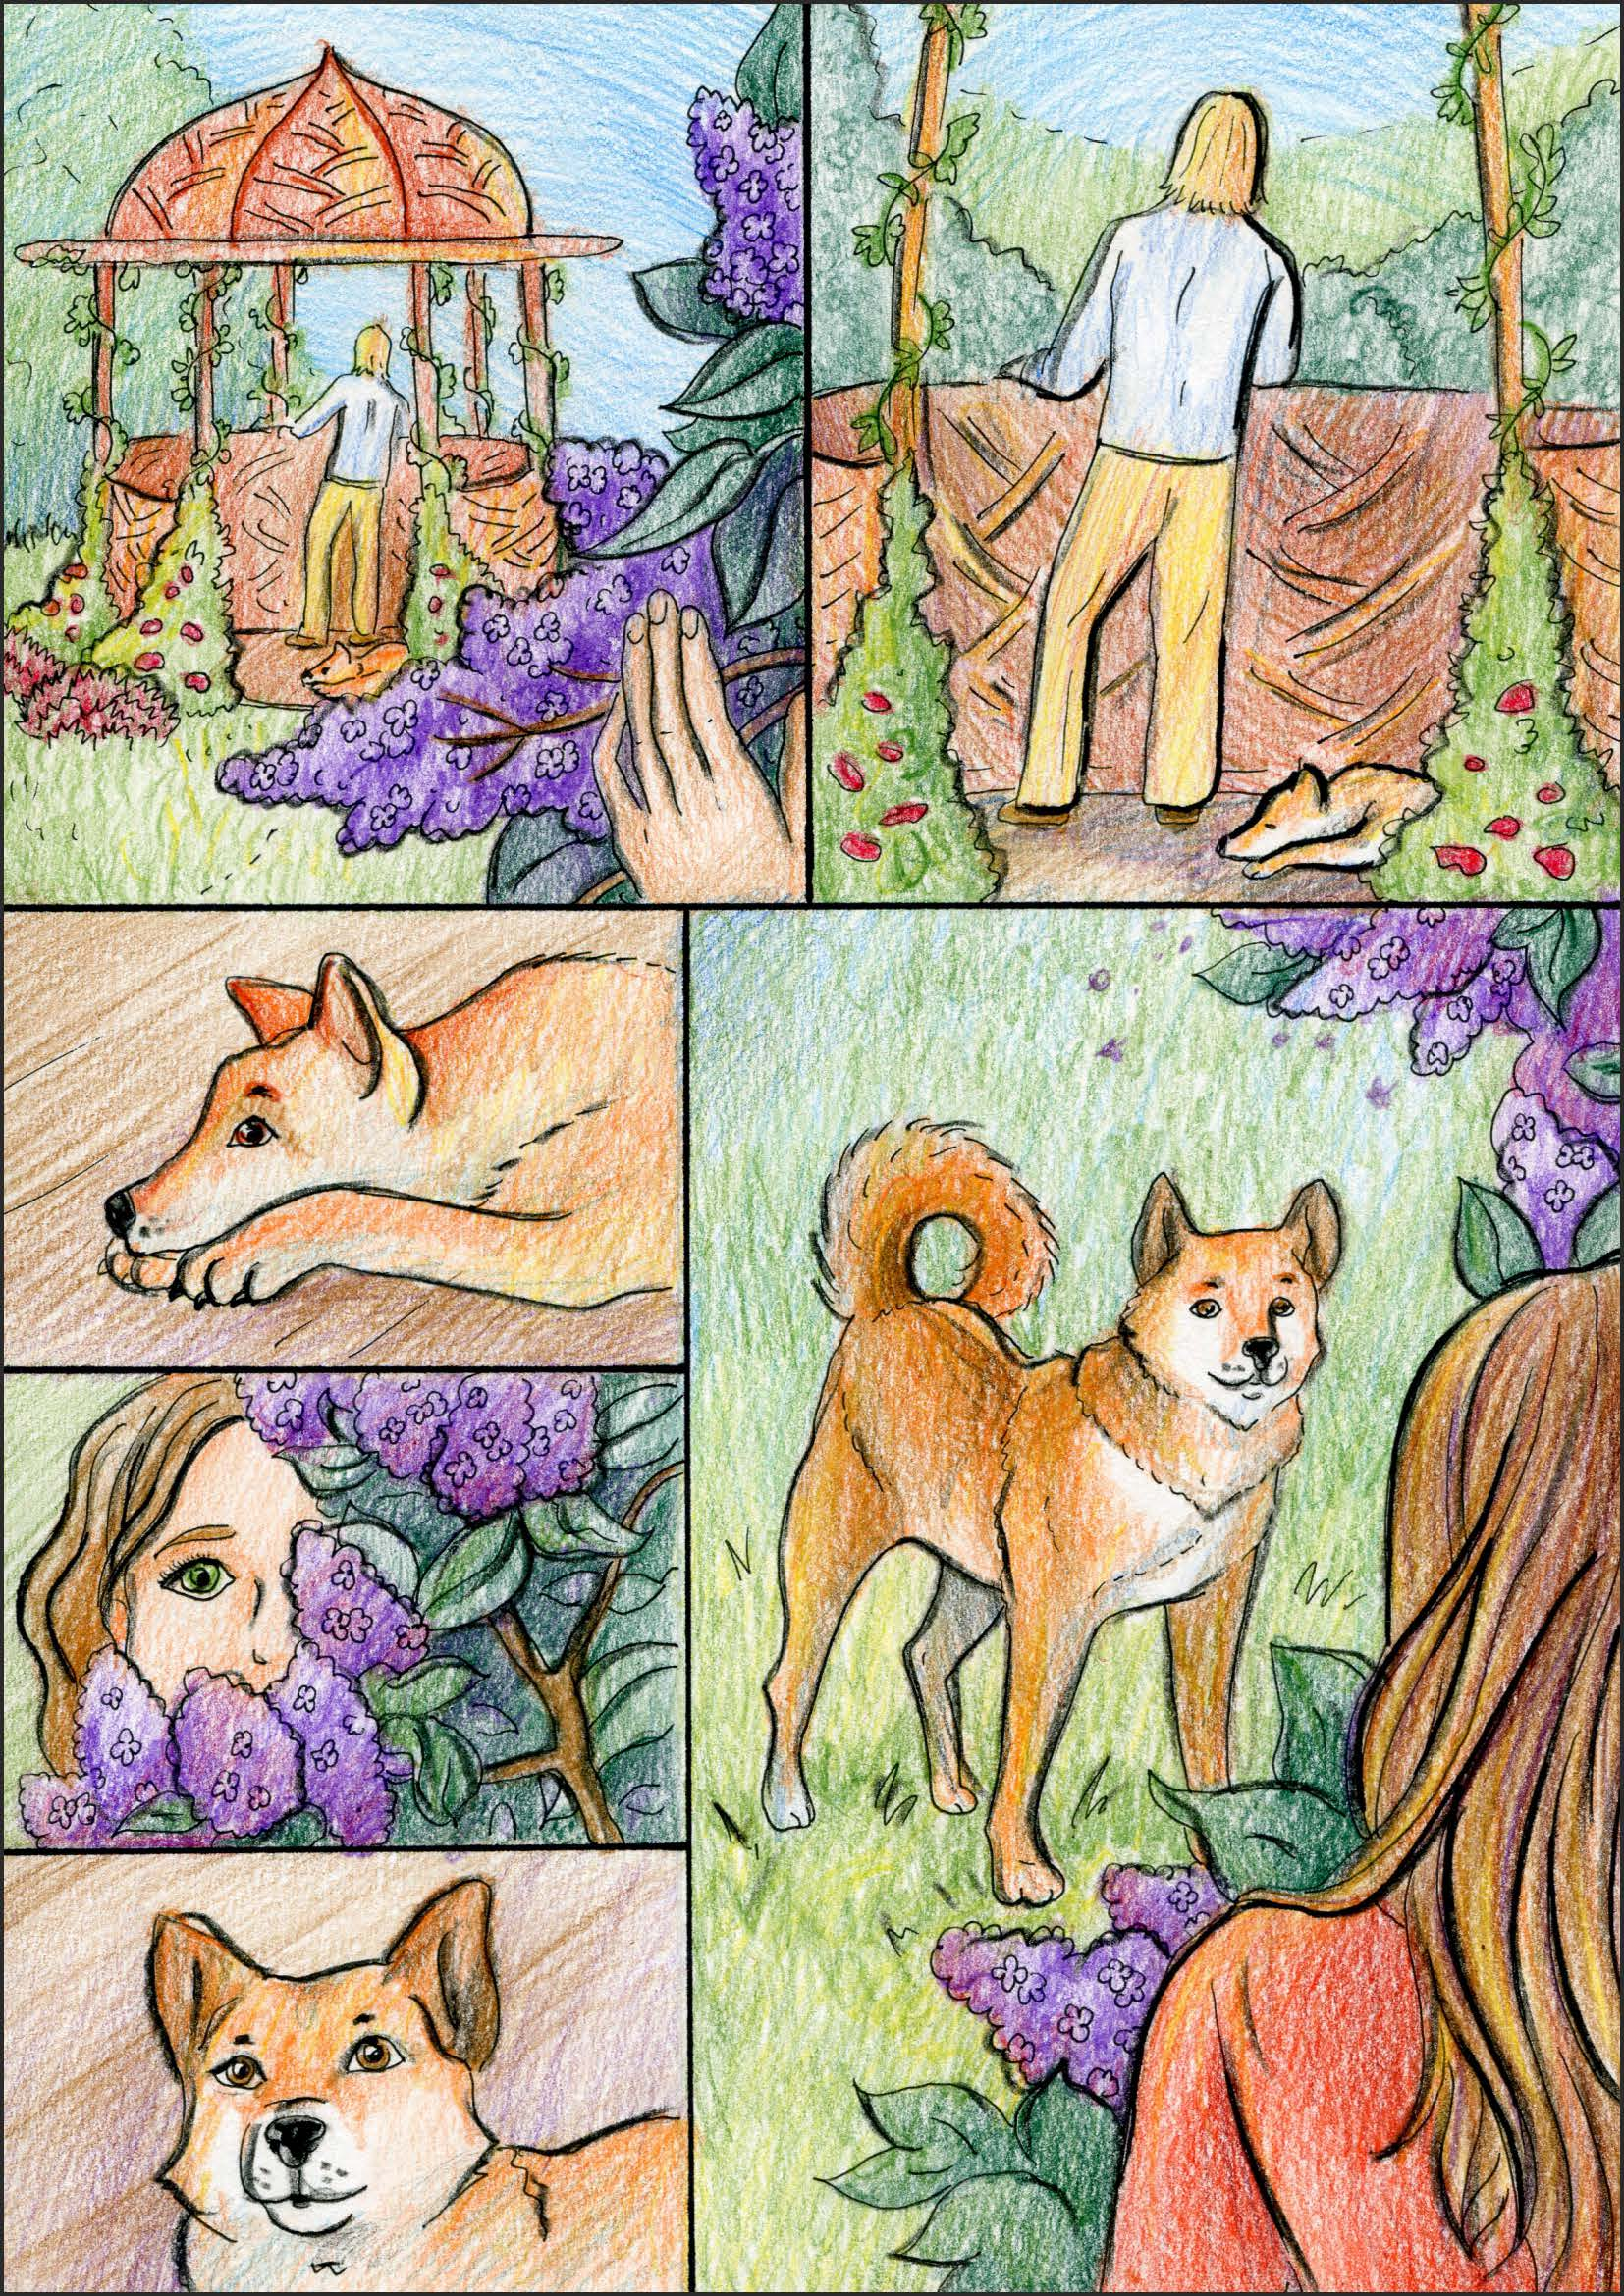 Анна Гейдебрехт. Комикс Зовущая мечта (12).jpg